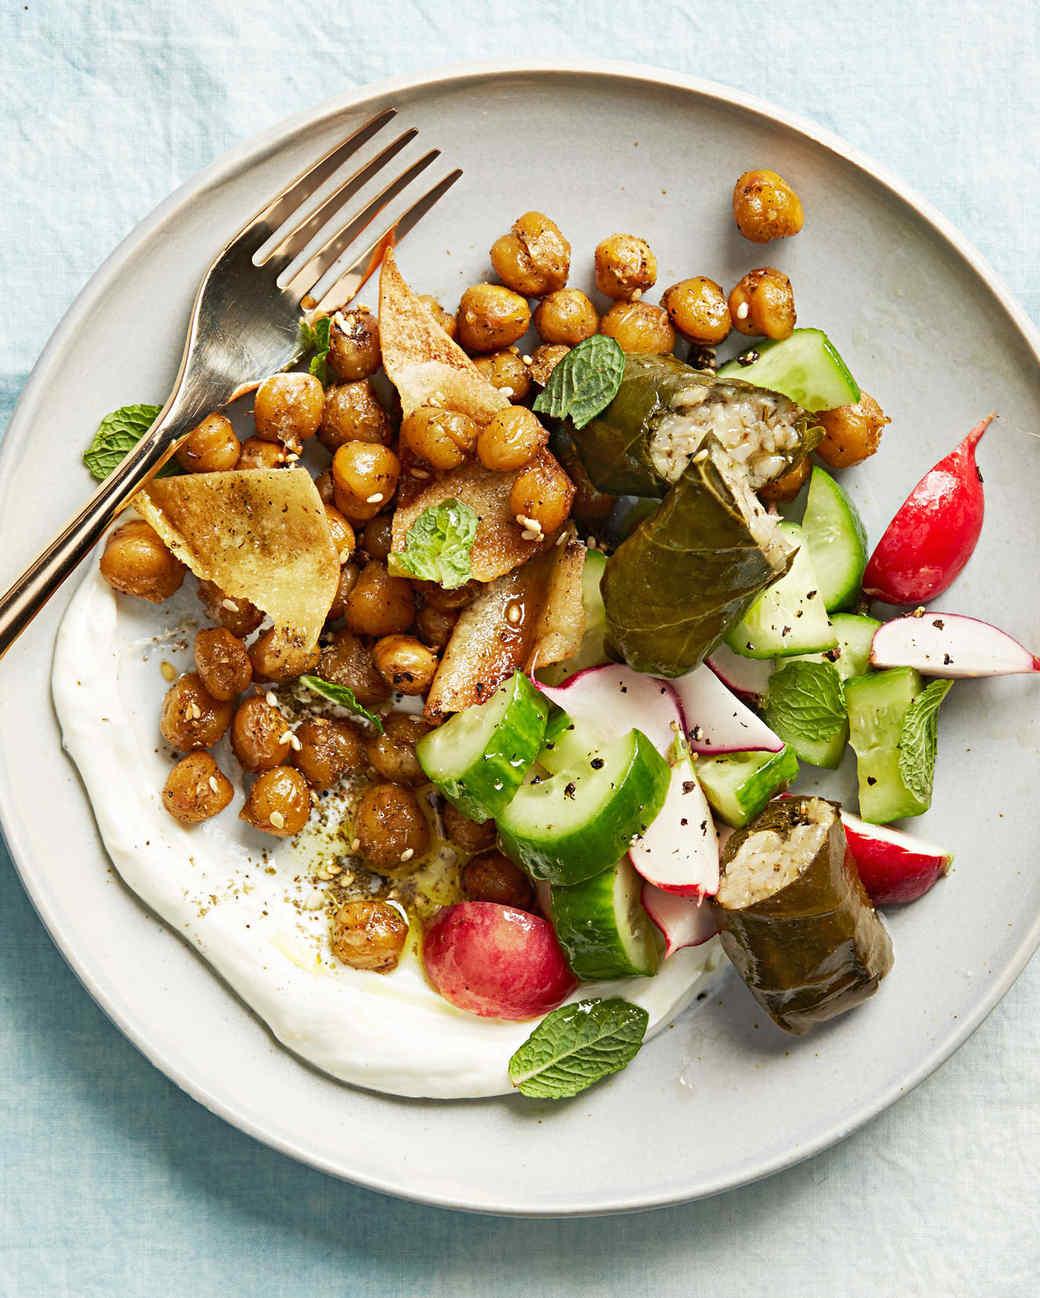 Greek mezze salad